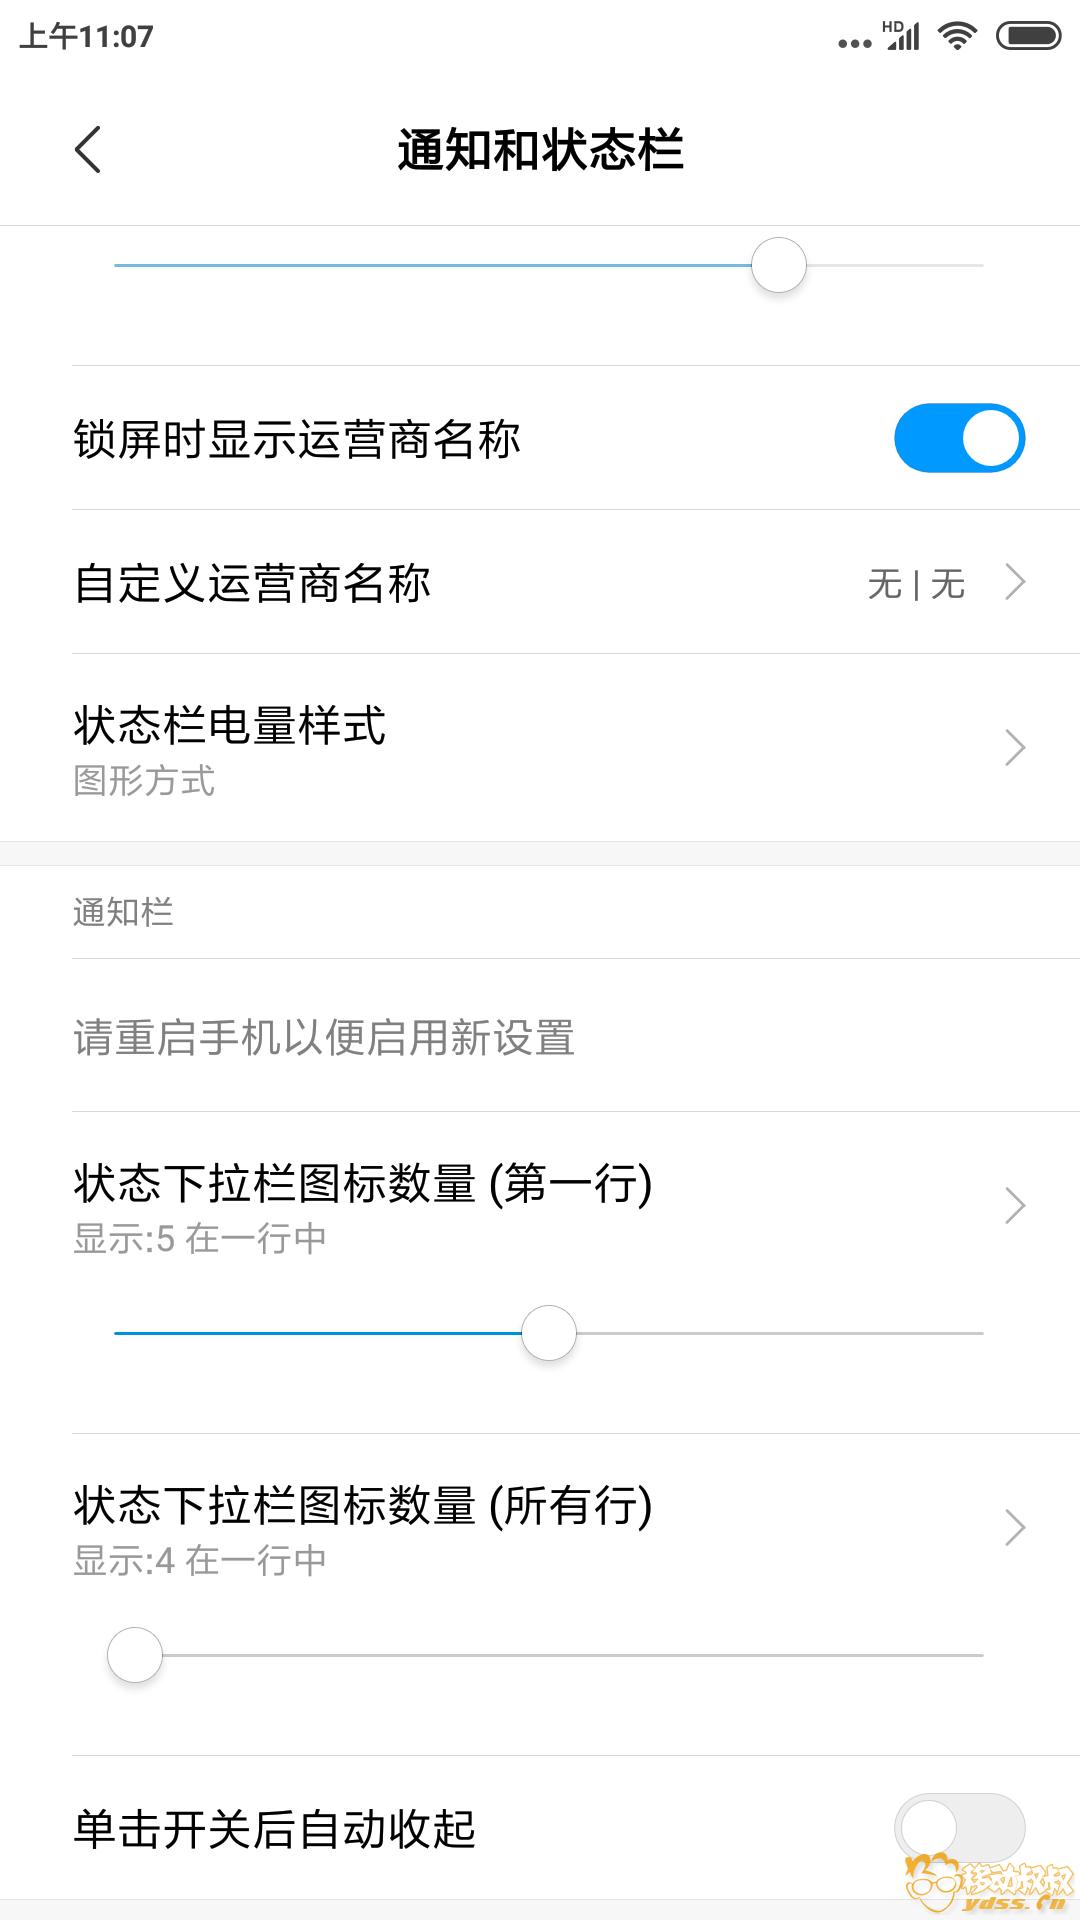 Screenshot_2018-07-02-11-07-09-047_com.android.settings.png